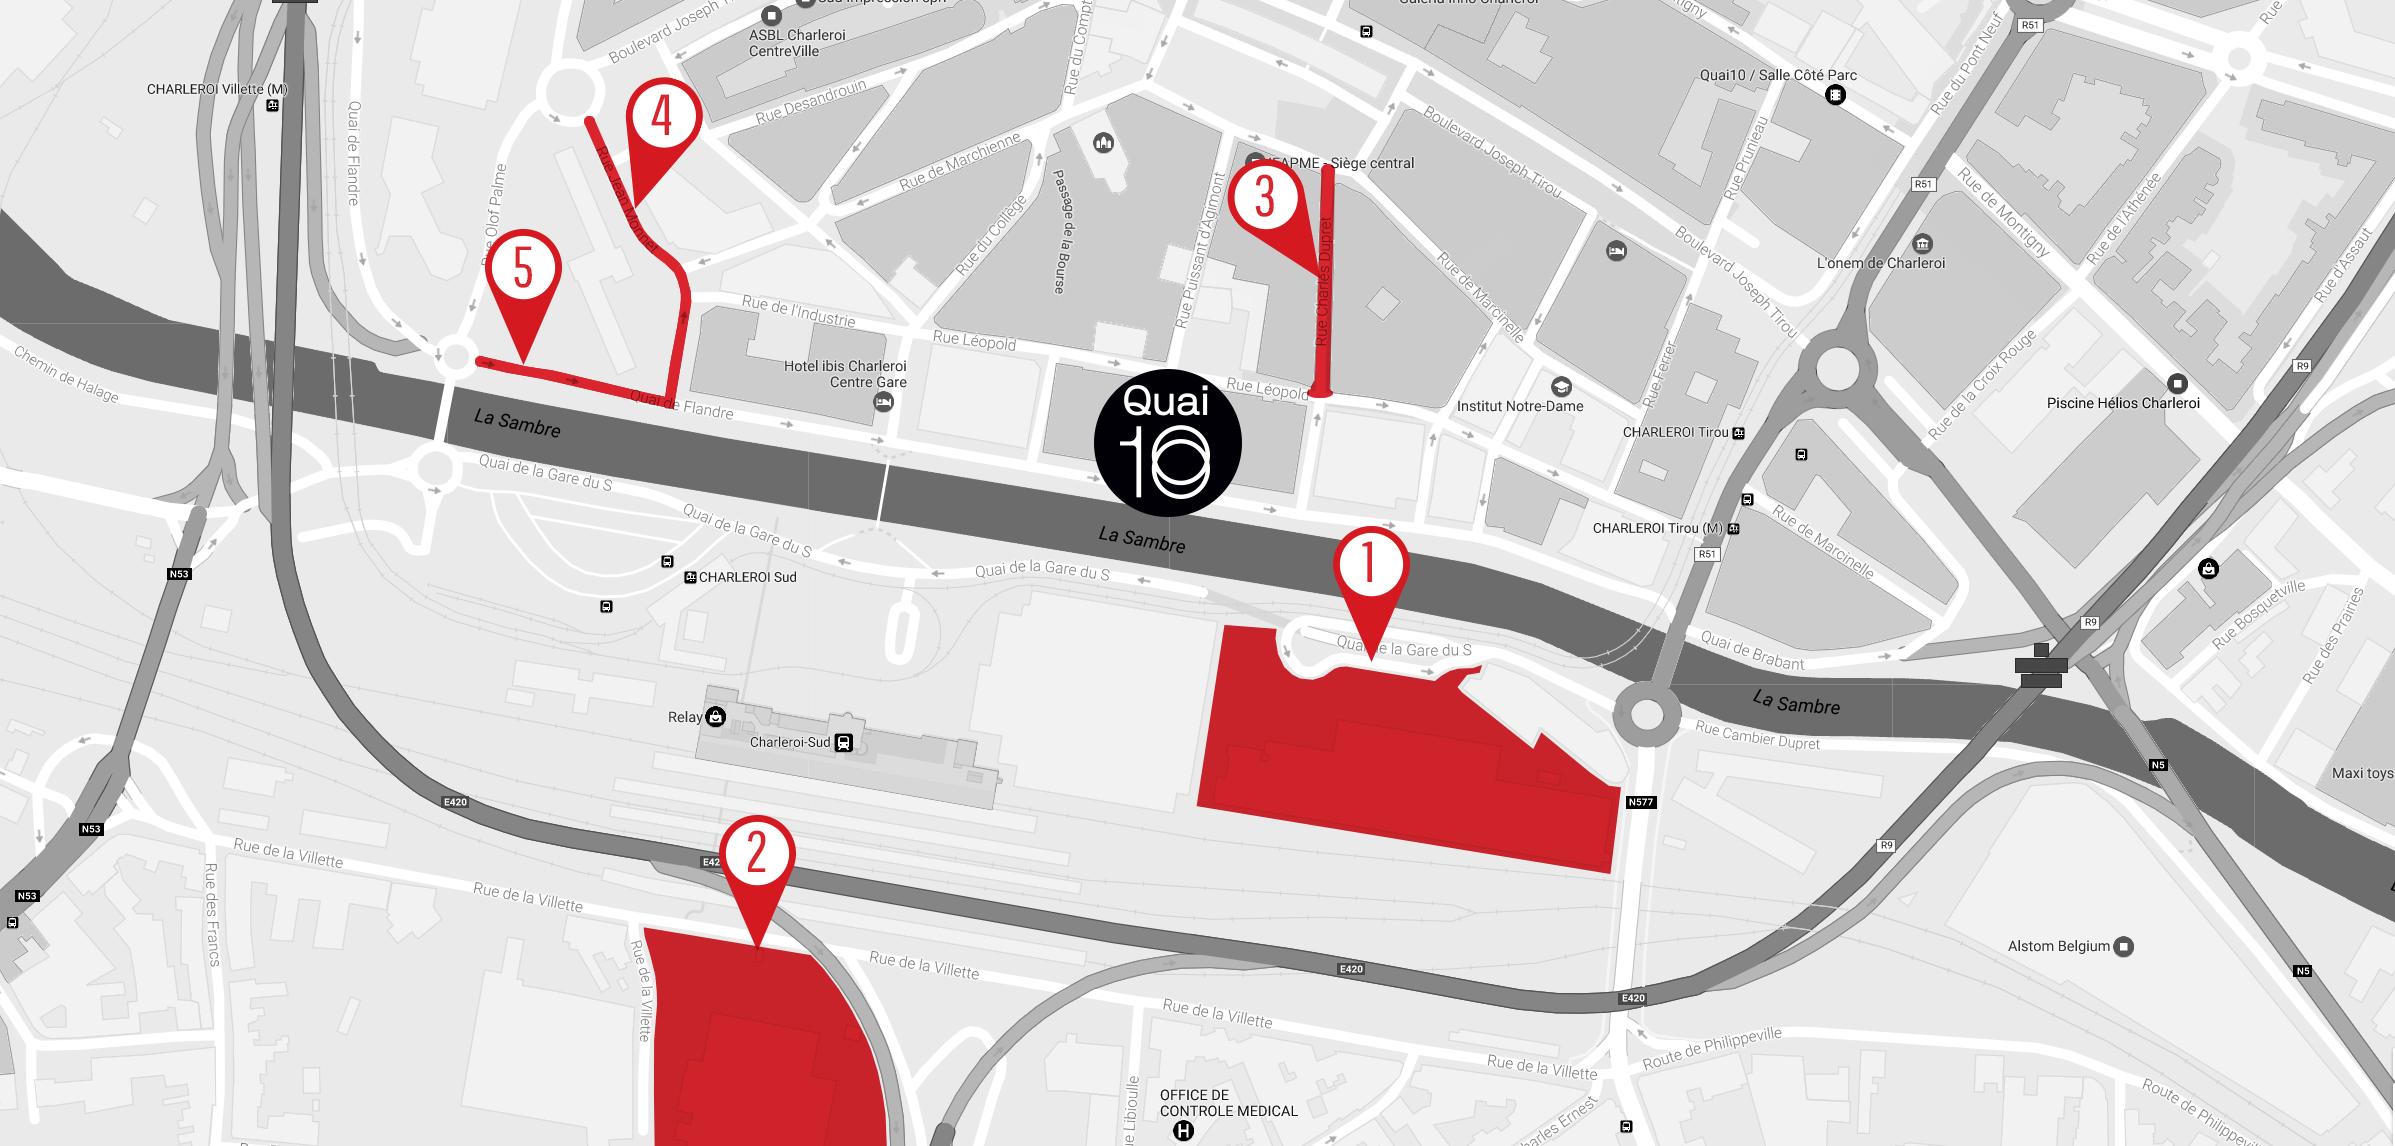 Quai10 - Parking